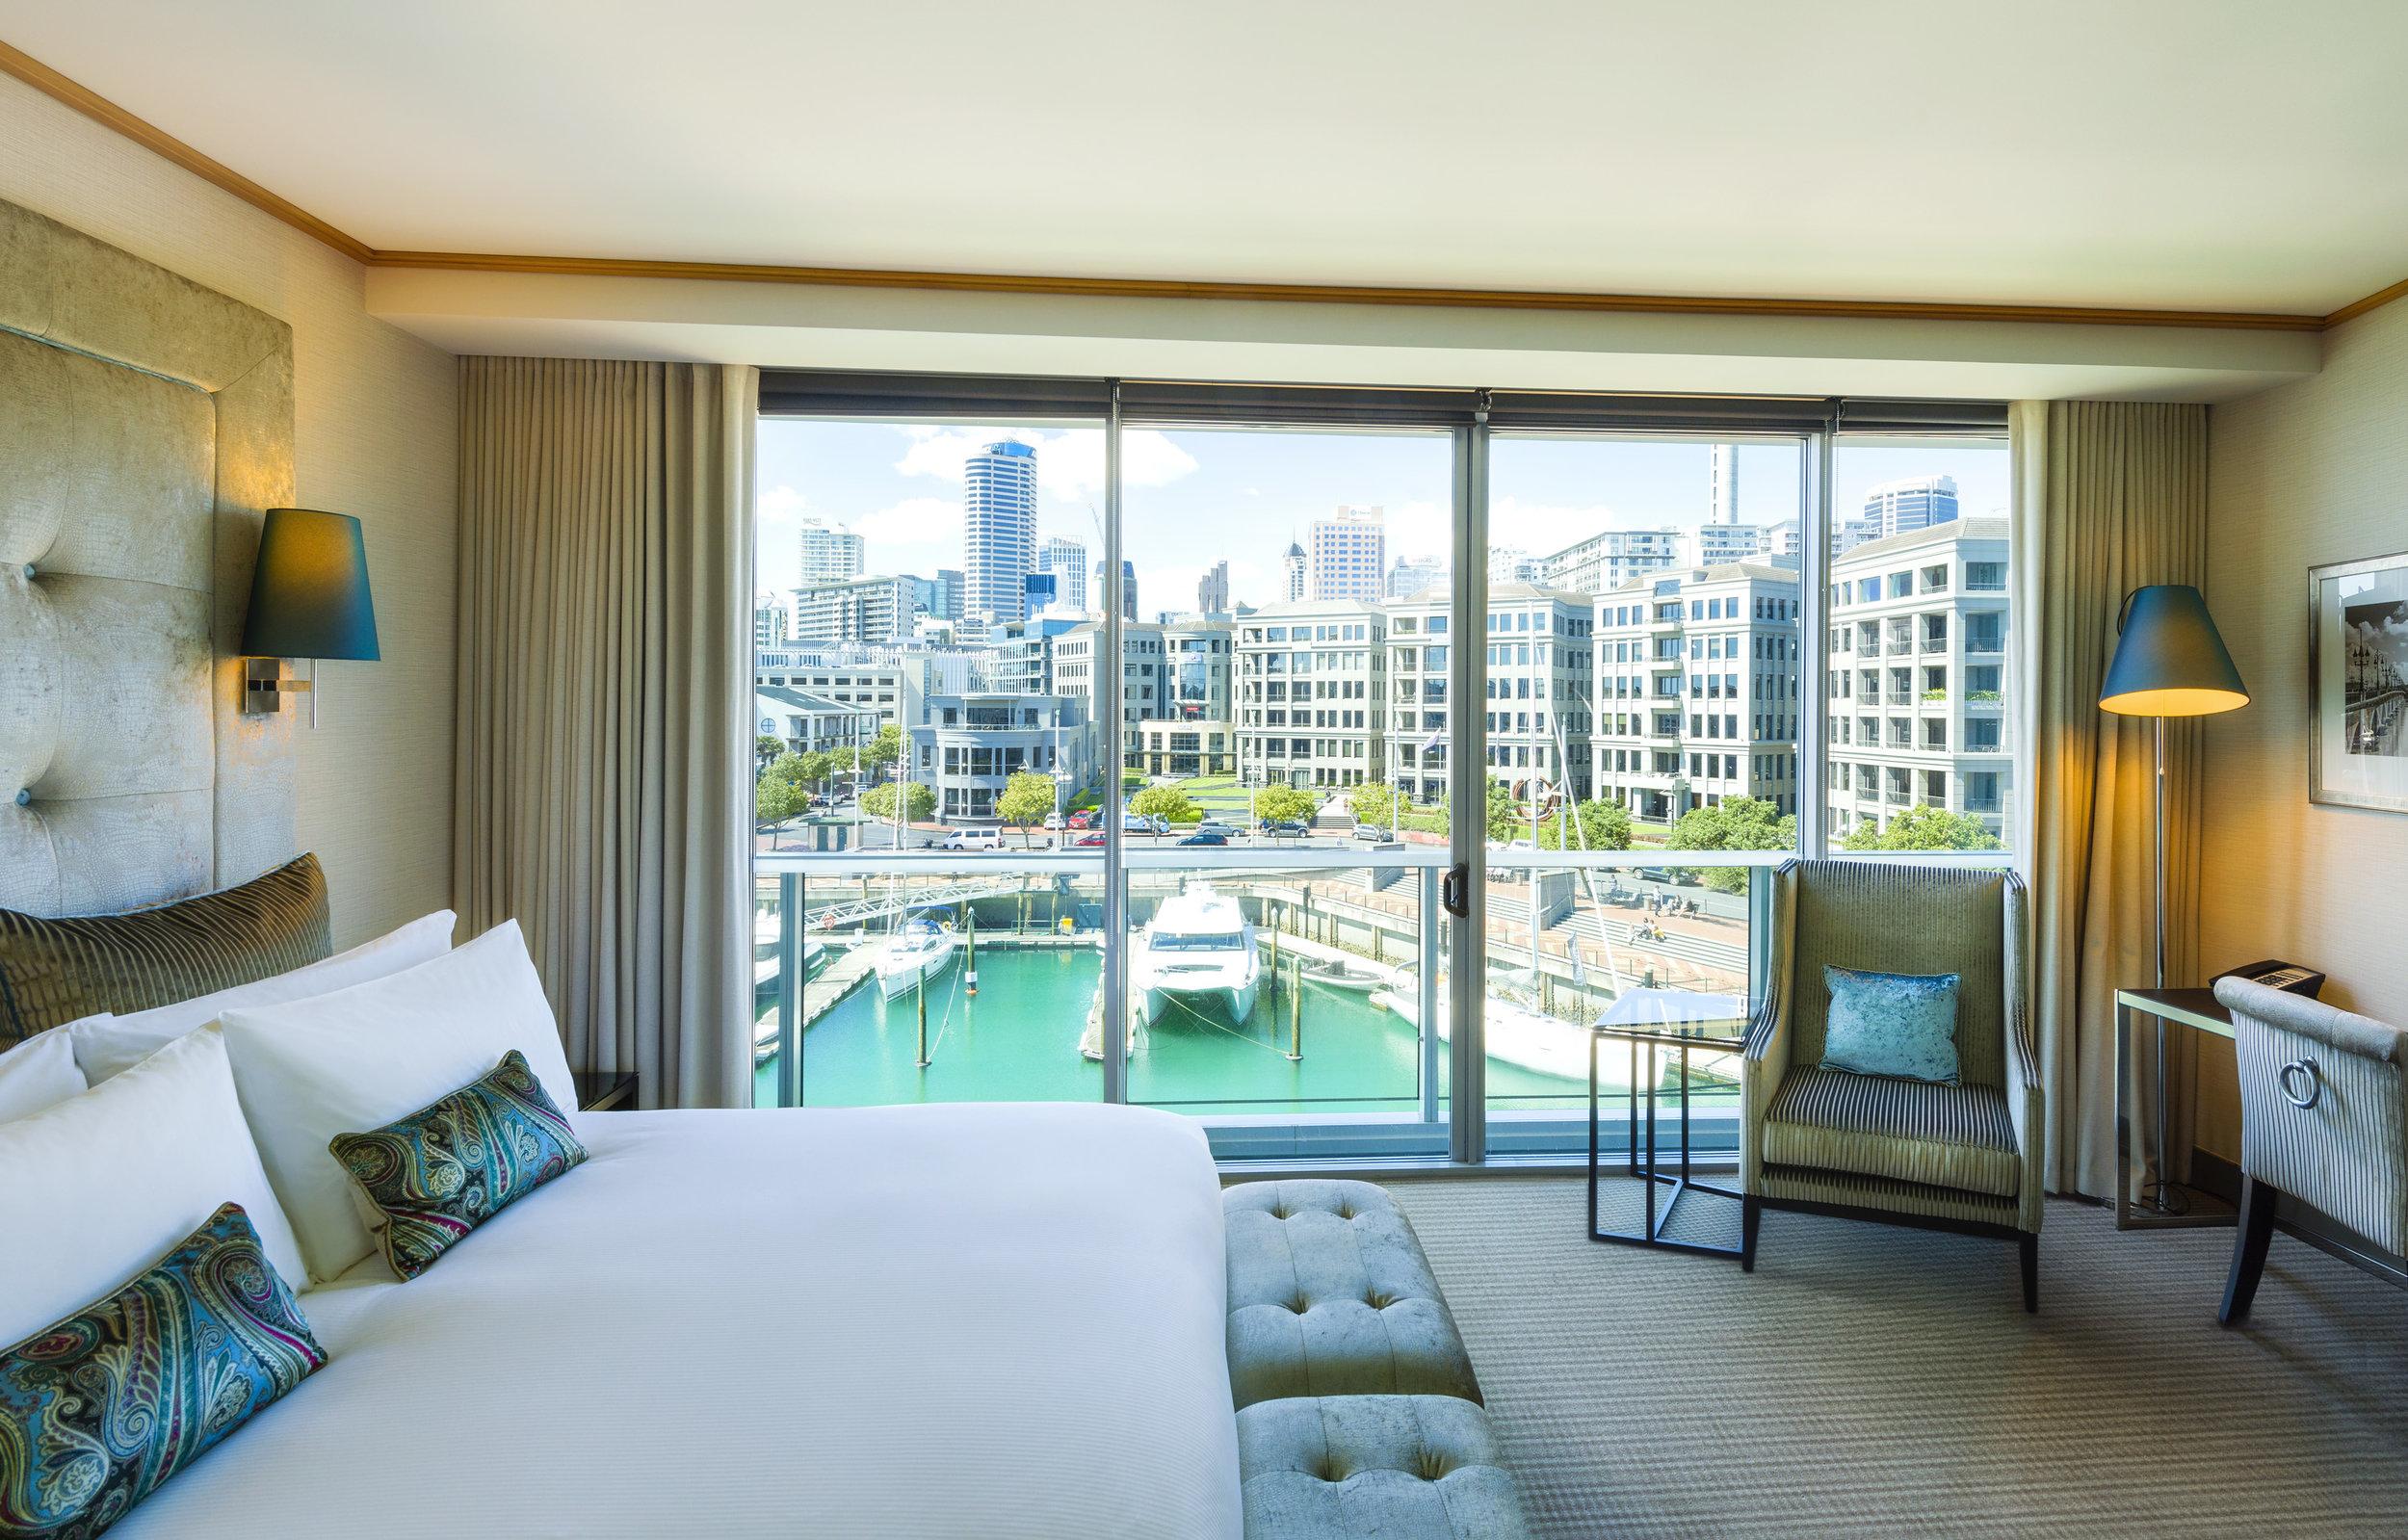 Sofitel Auckland Luxury Marina View JPEG 2MB.jpg